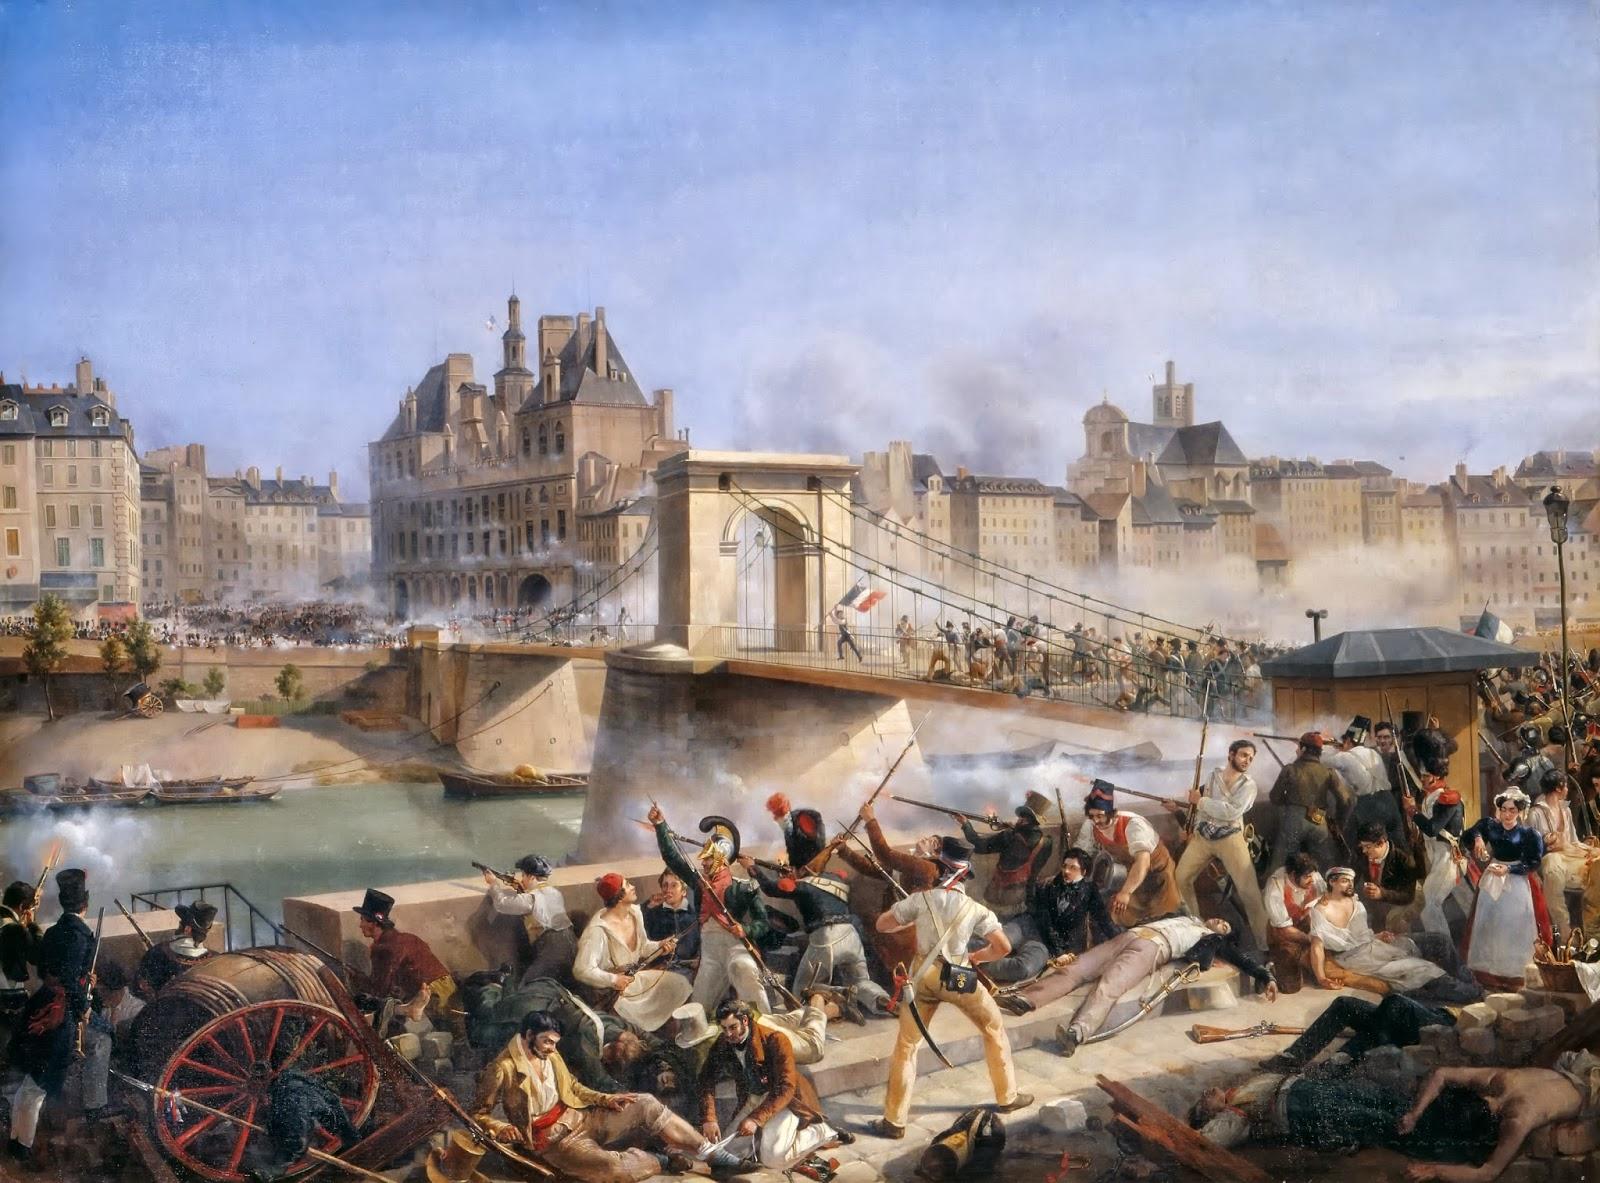 italian revolution 1830 1848 Spanish, two sicilies, greek, and italian revolutions two sicilies revolution (1820) greek revolution (1821) italian revolution (1848) image by goodtextures:.